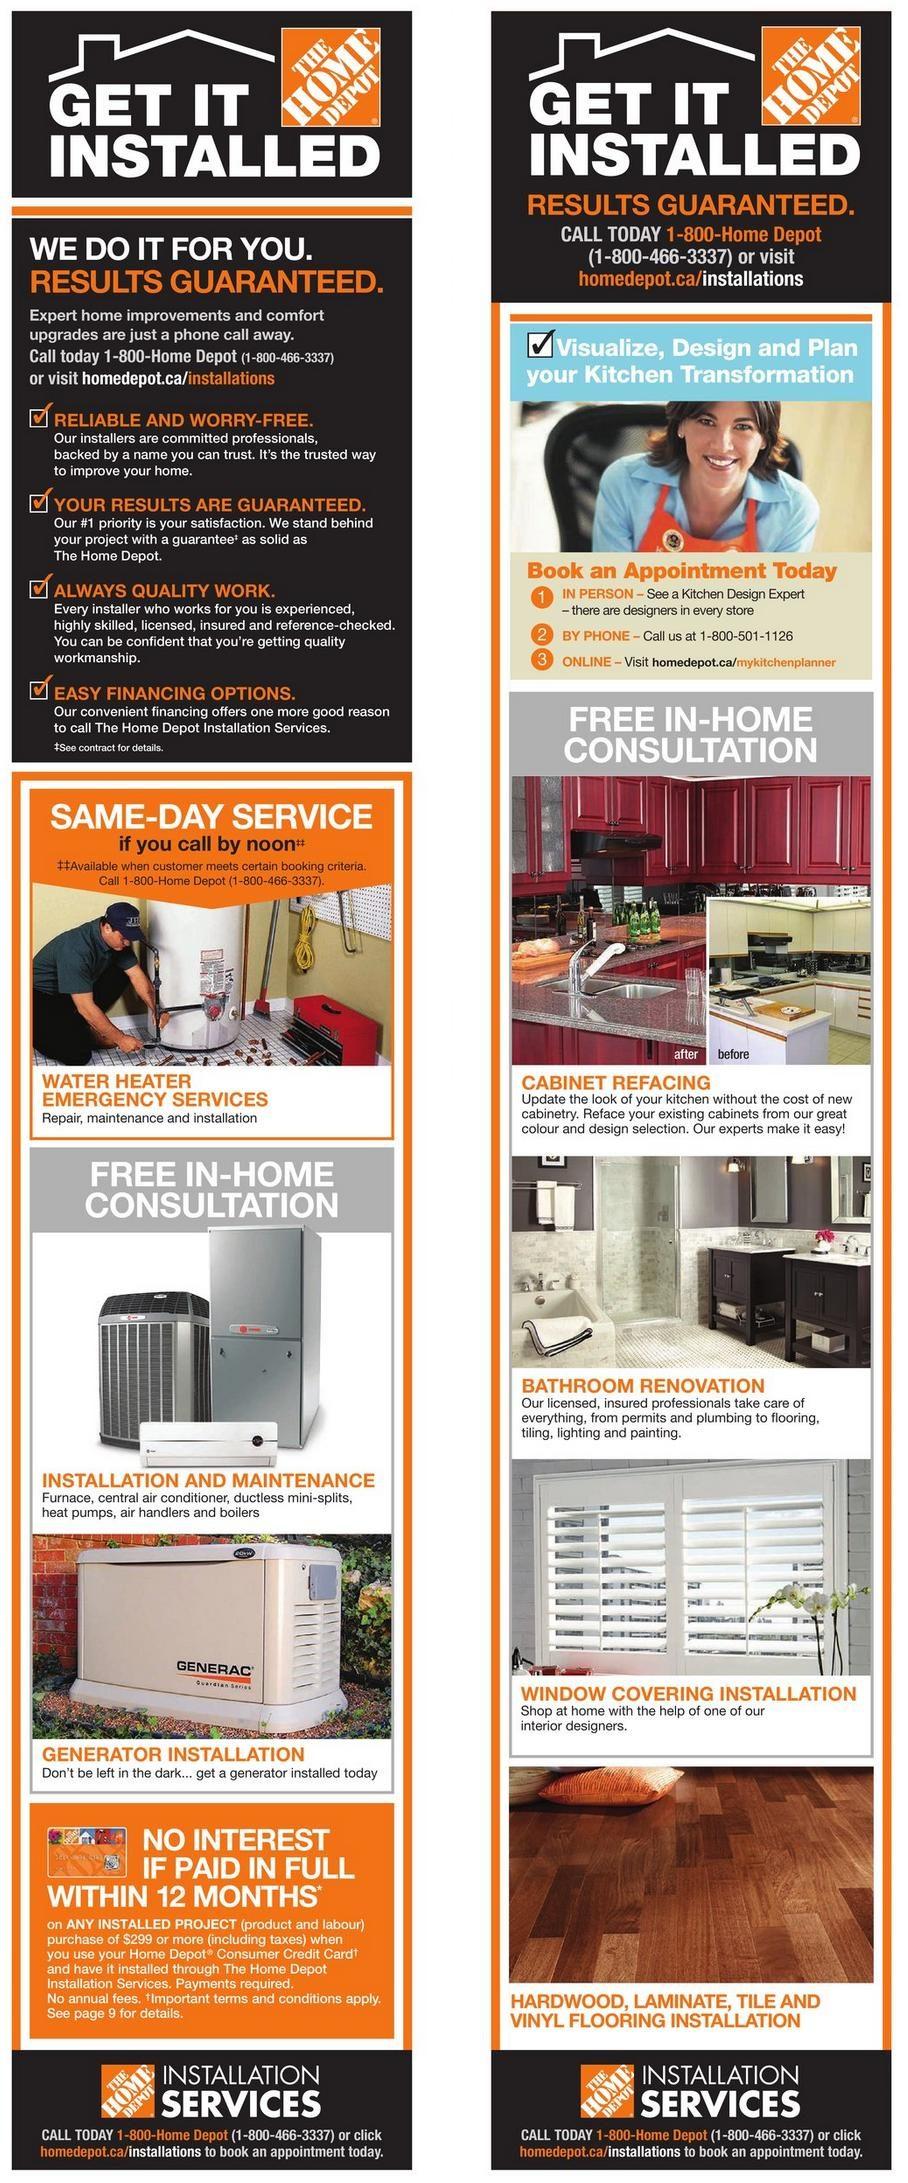 Bathroom Renovation Cost Redflagdeals home depot weekly flyer - weekly flyer - bath event - feb 6 – 12